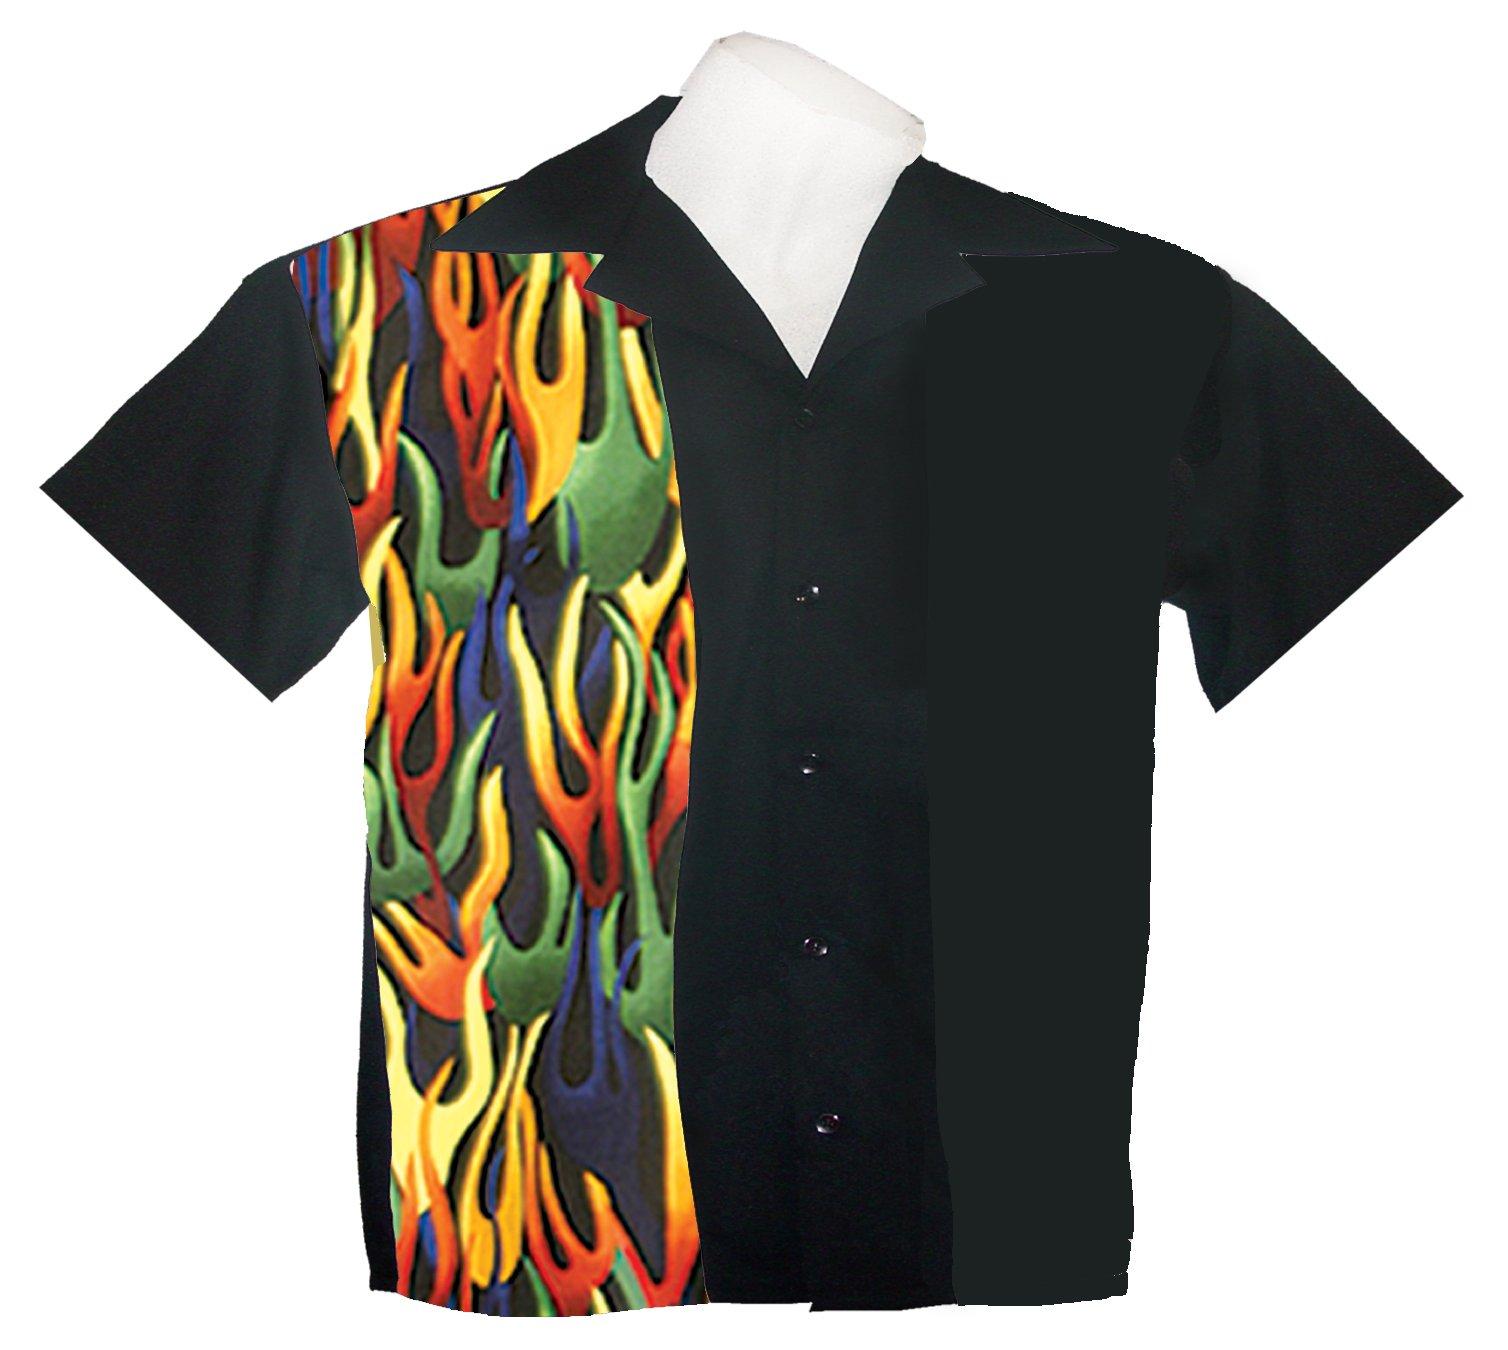 Tutti Boys Bowling Shirts Children Sizes Small 2T-3T Yrs, Medium 4-5 Yrs, Large 6-7 Yrs (Small 2T-3T Yrs)